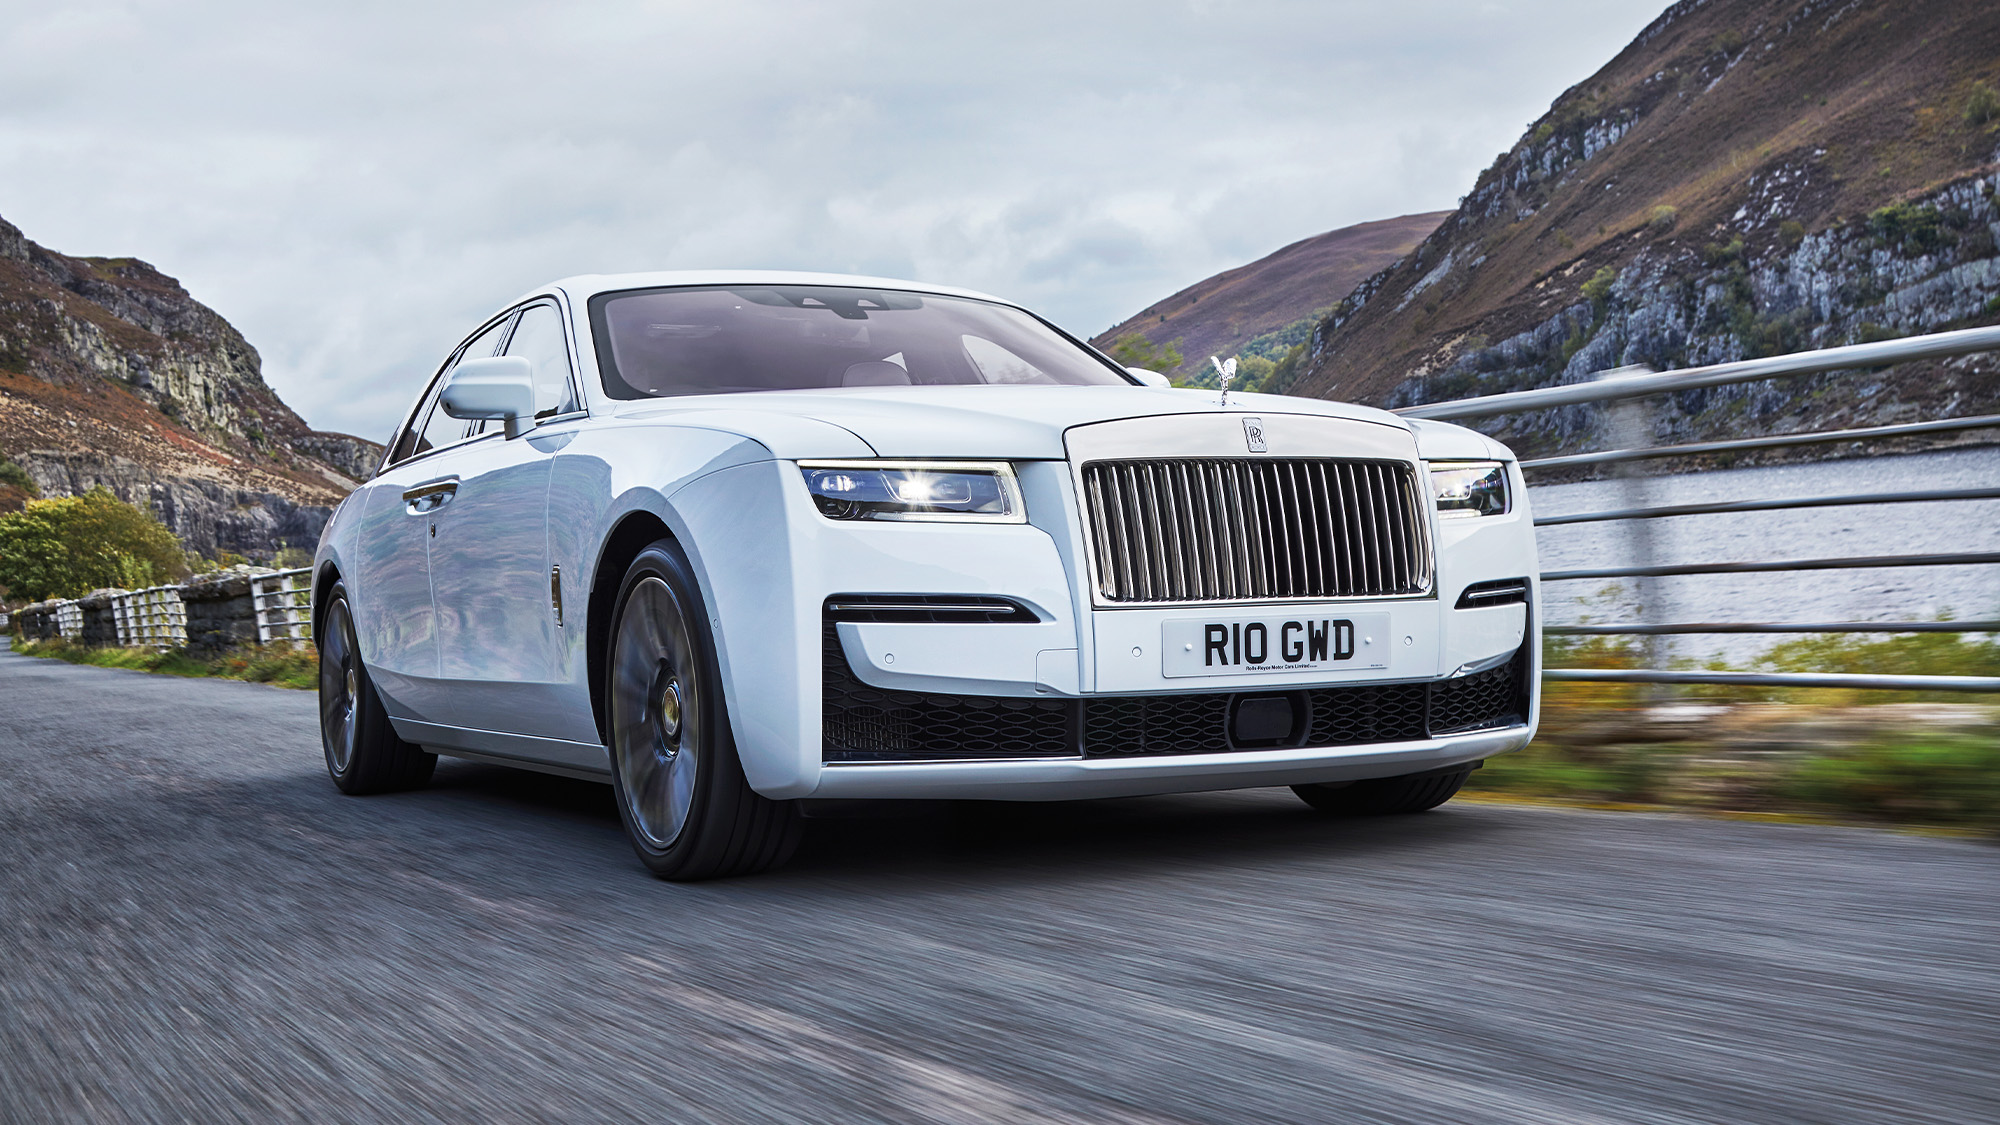 2020 Rolls Royce Ghost front